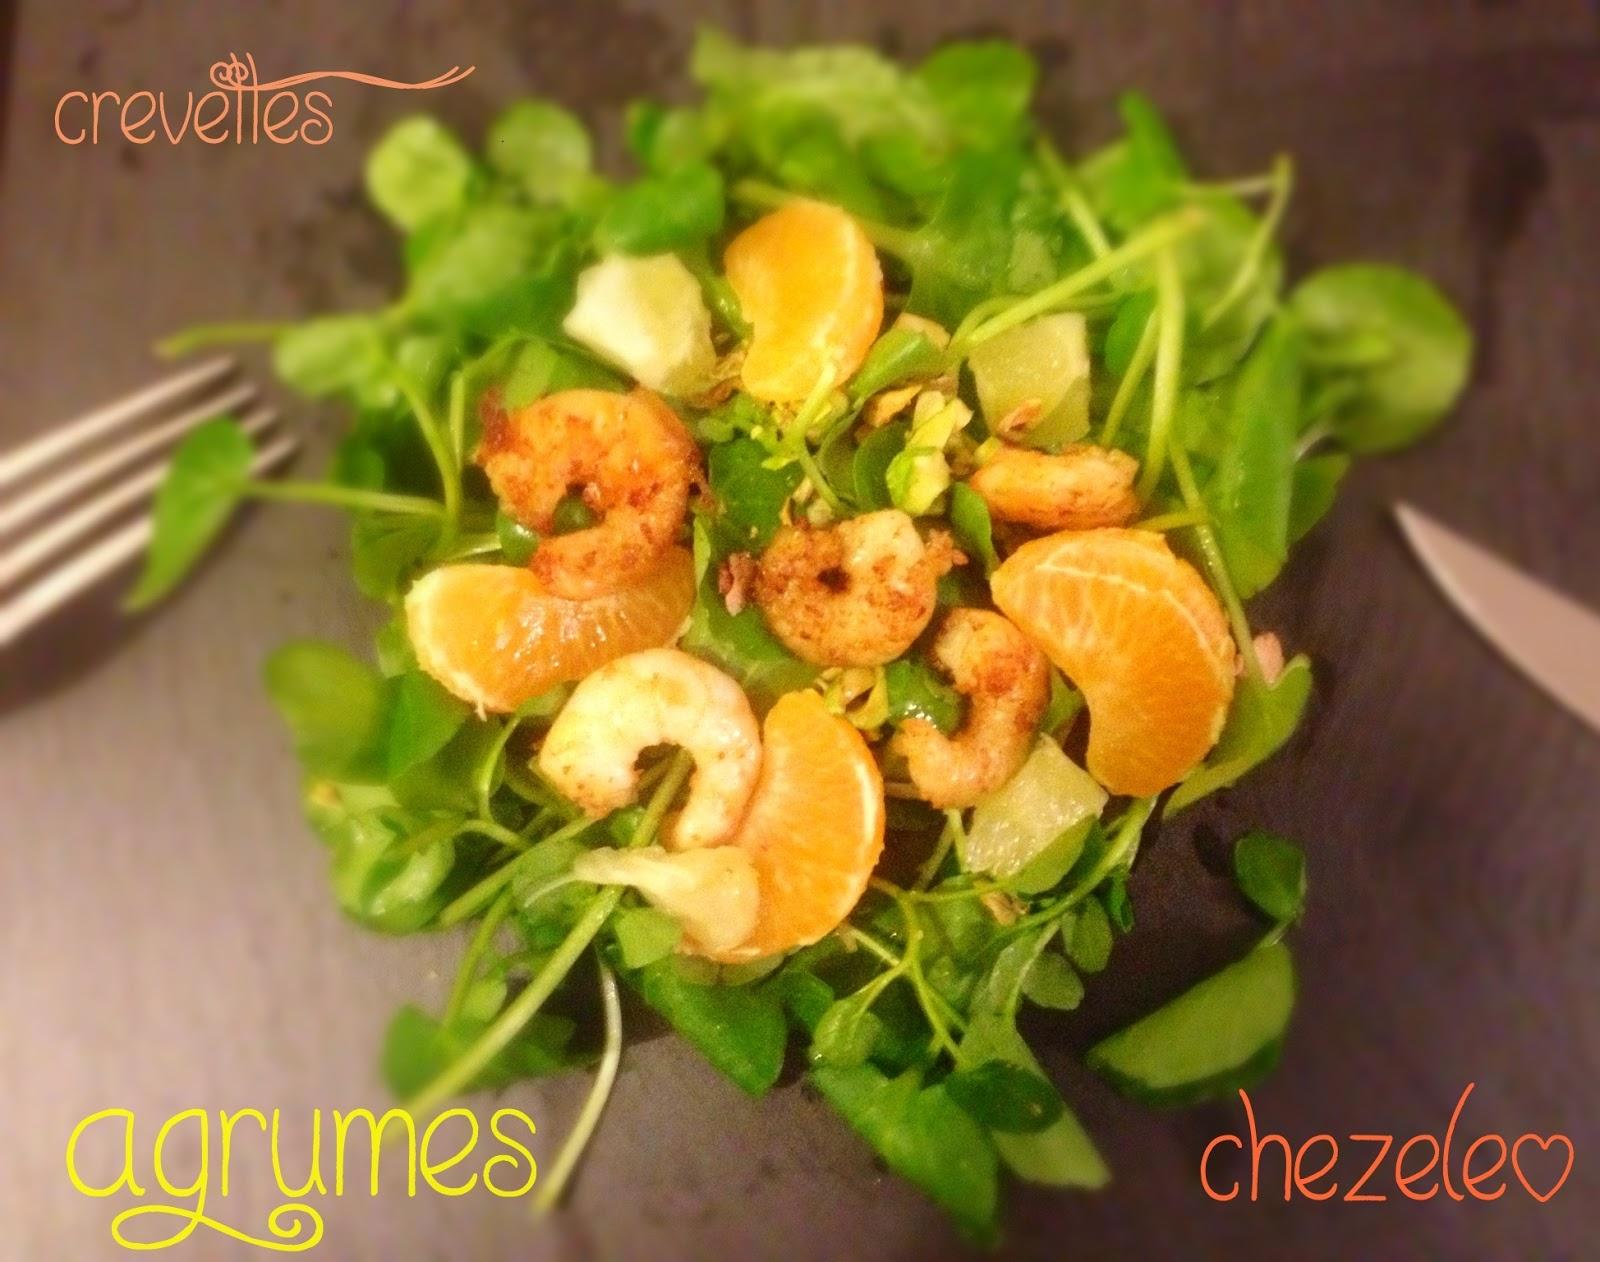 Chez el o salade de crevettes et d 39 agrumes for Entree legere hiver